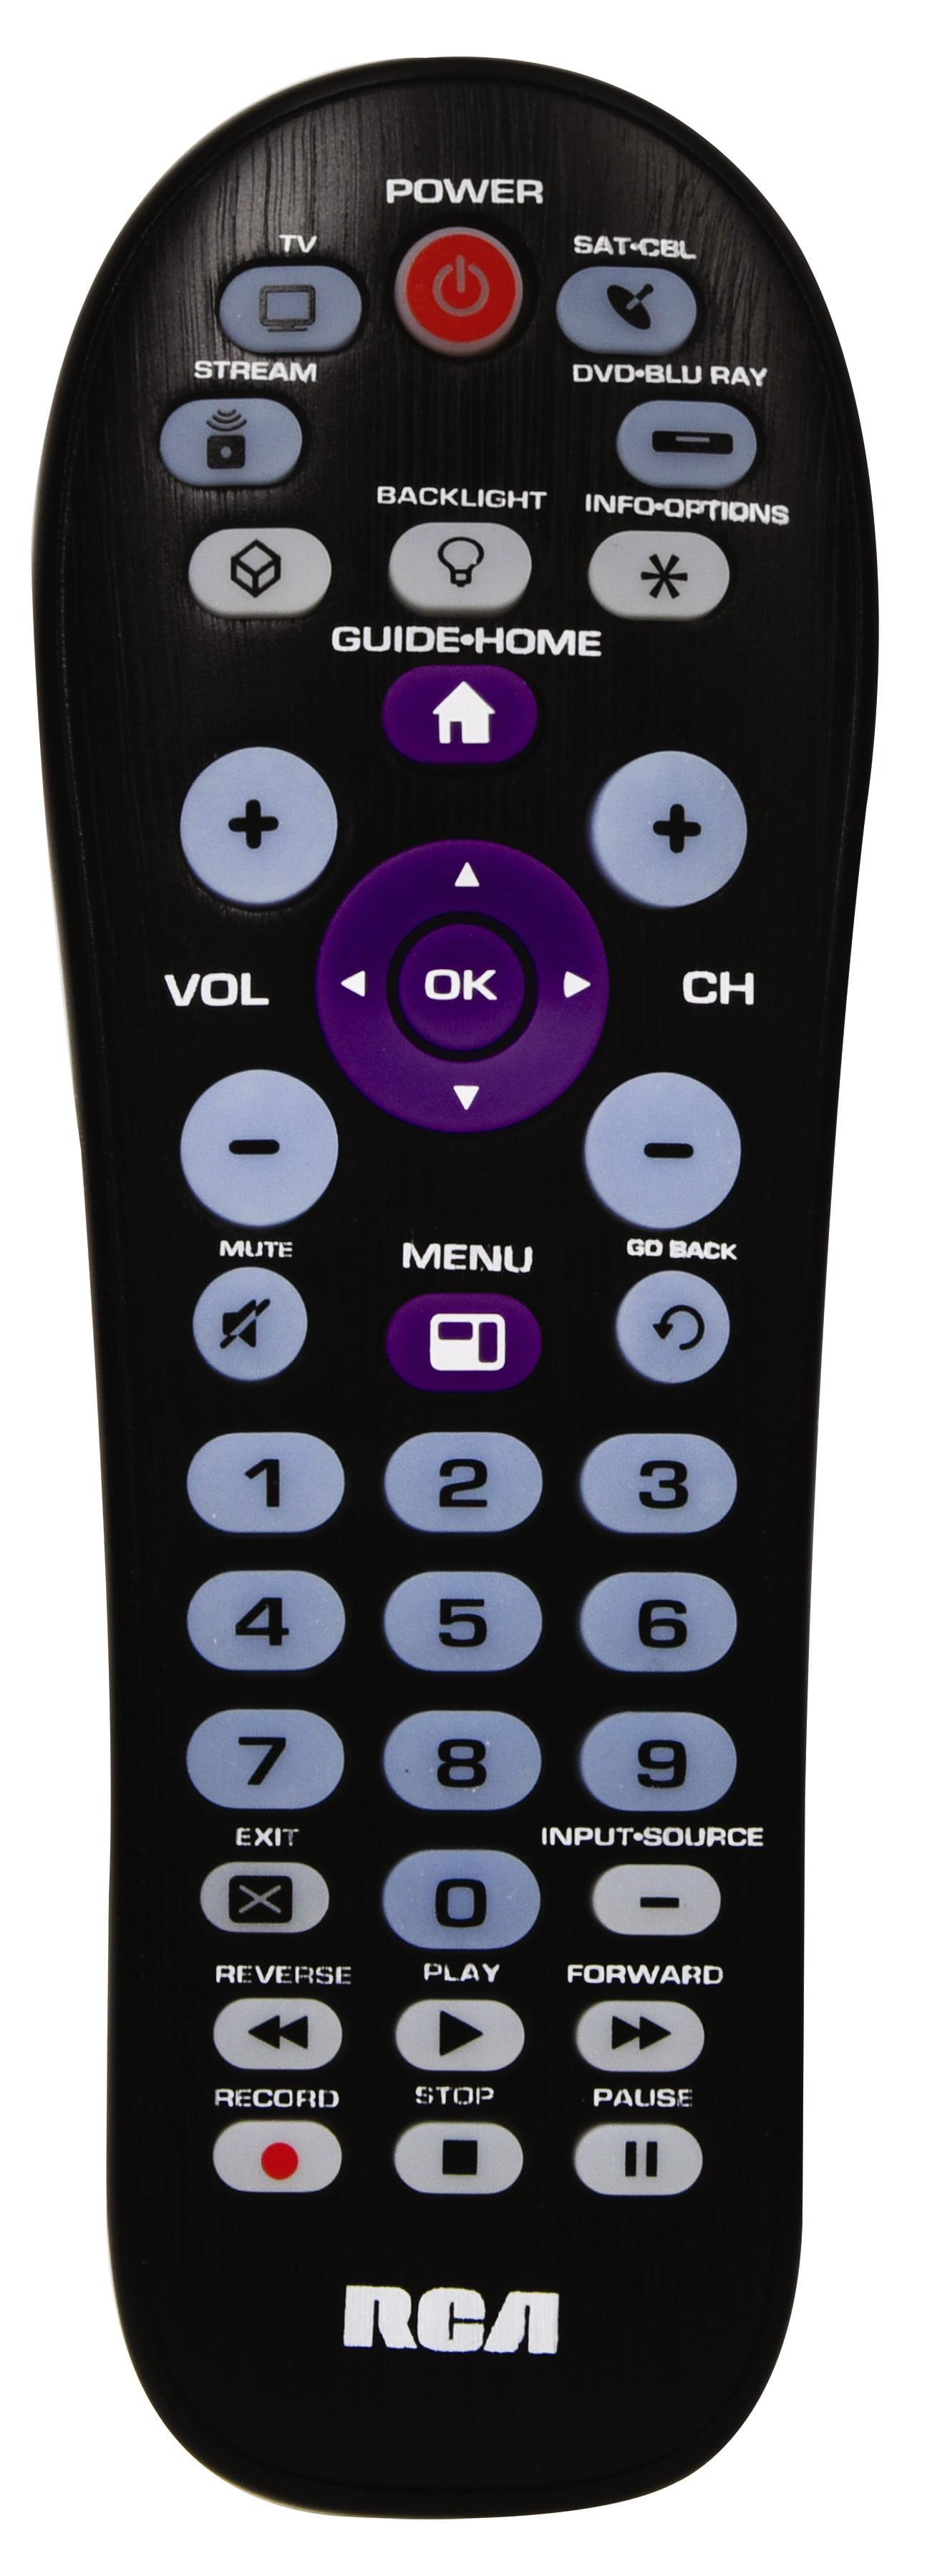 TH103PF12 TH-103PF12 TH103PF9 TH103PF12U TH-103PF9 TH-103PF12U OEM Panasonic Remote Control: TH103PF10UL TH-103PF10UL